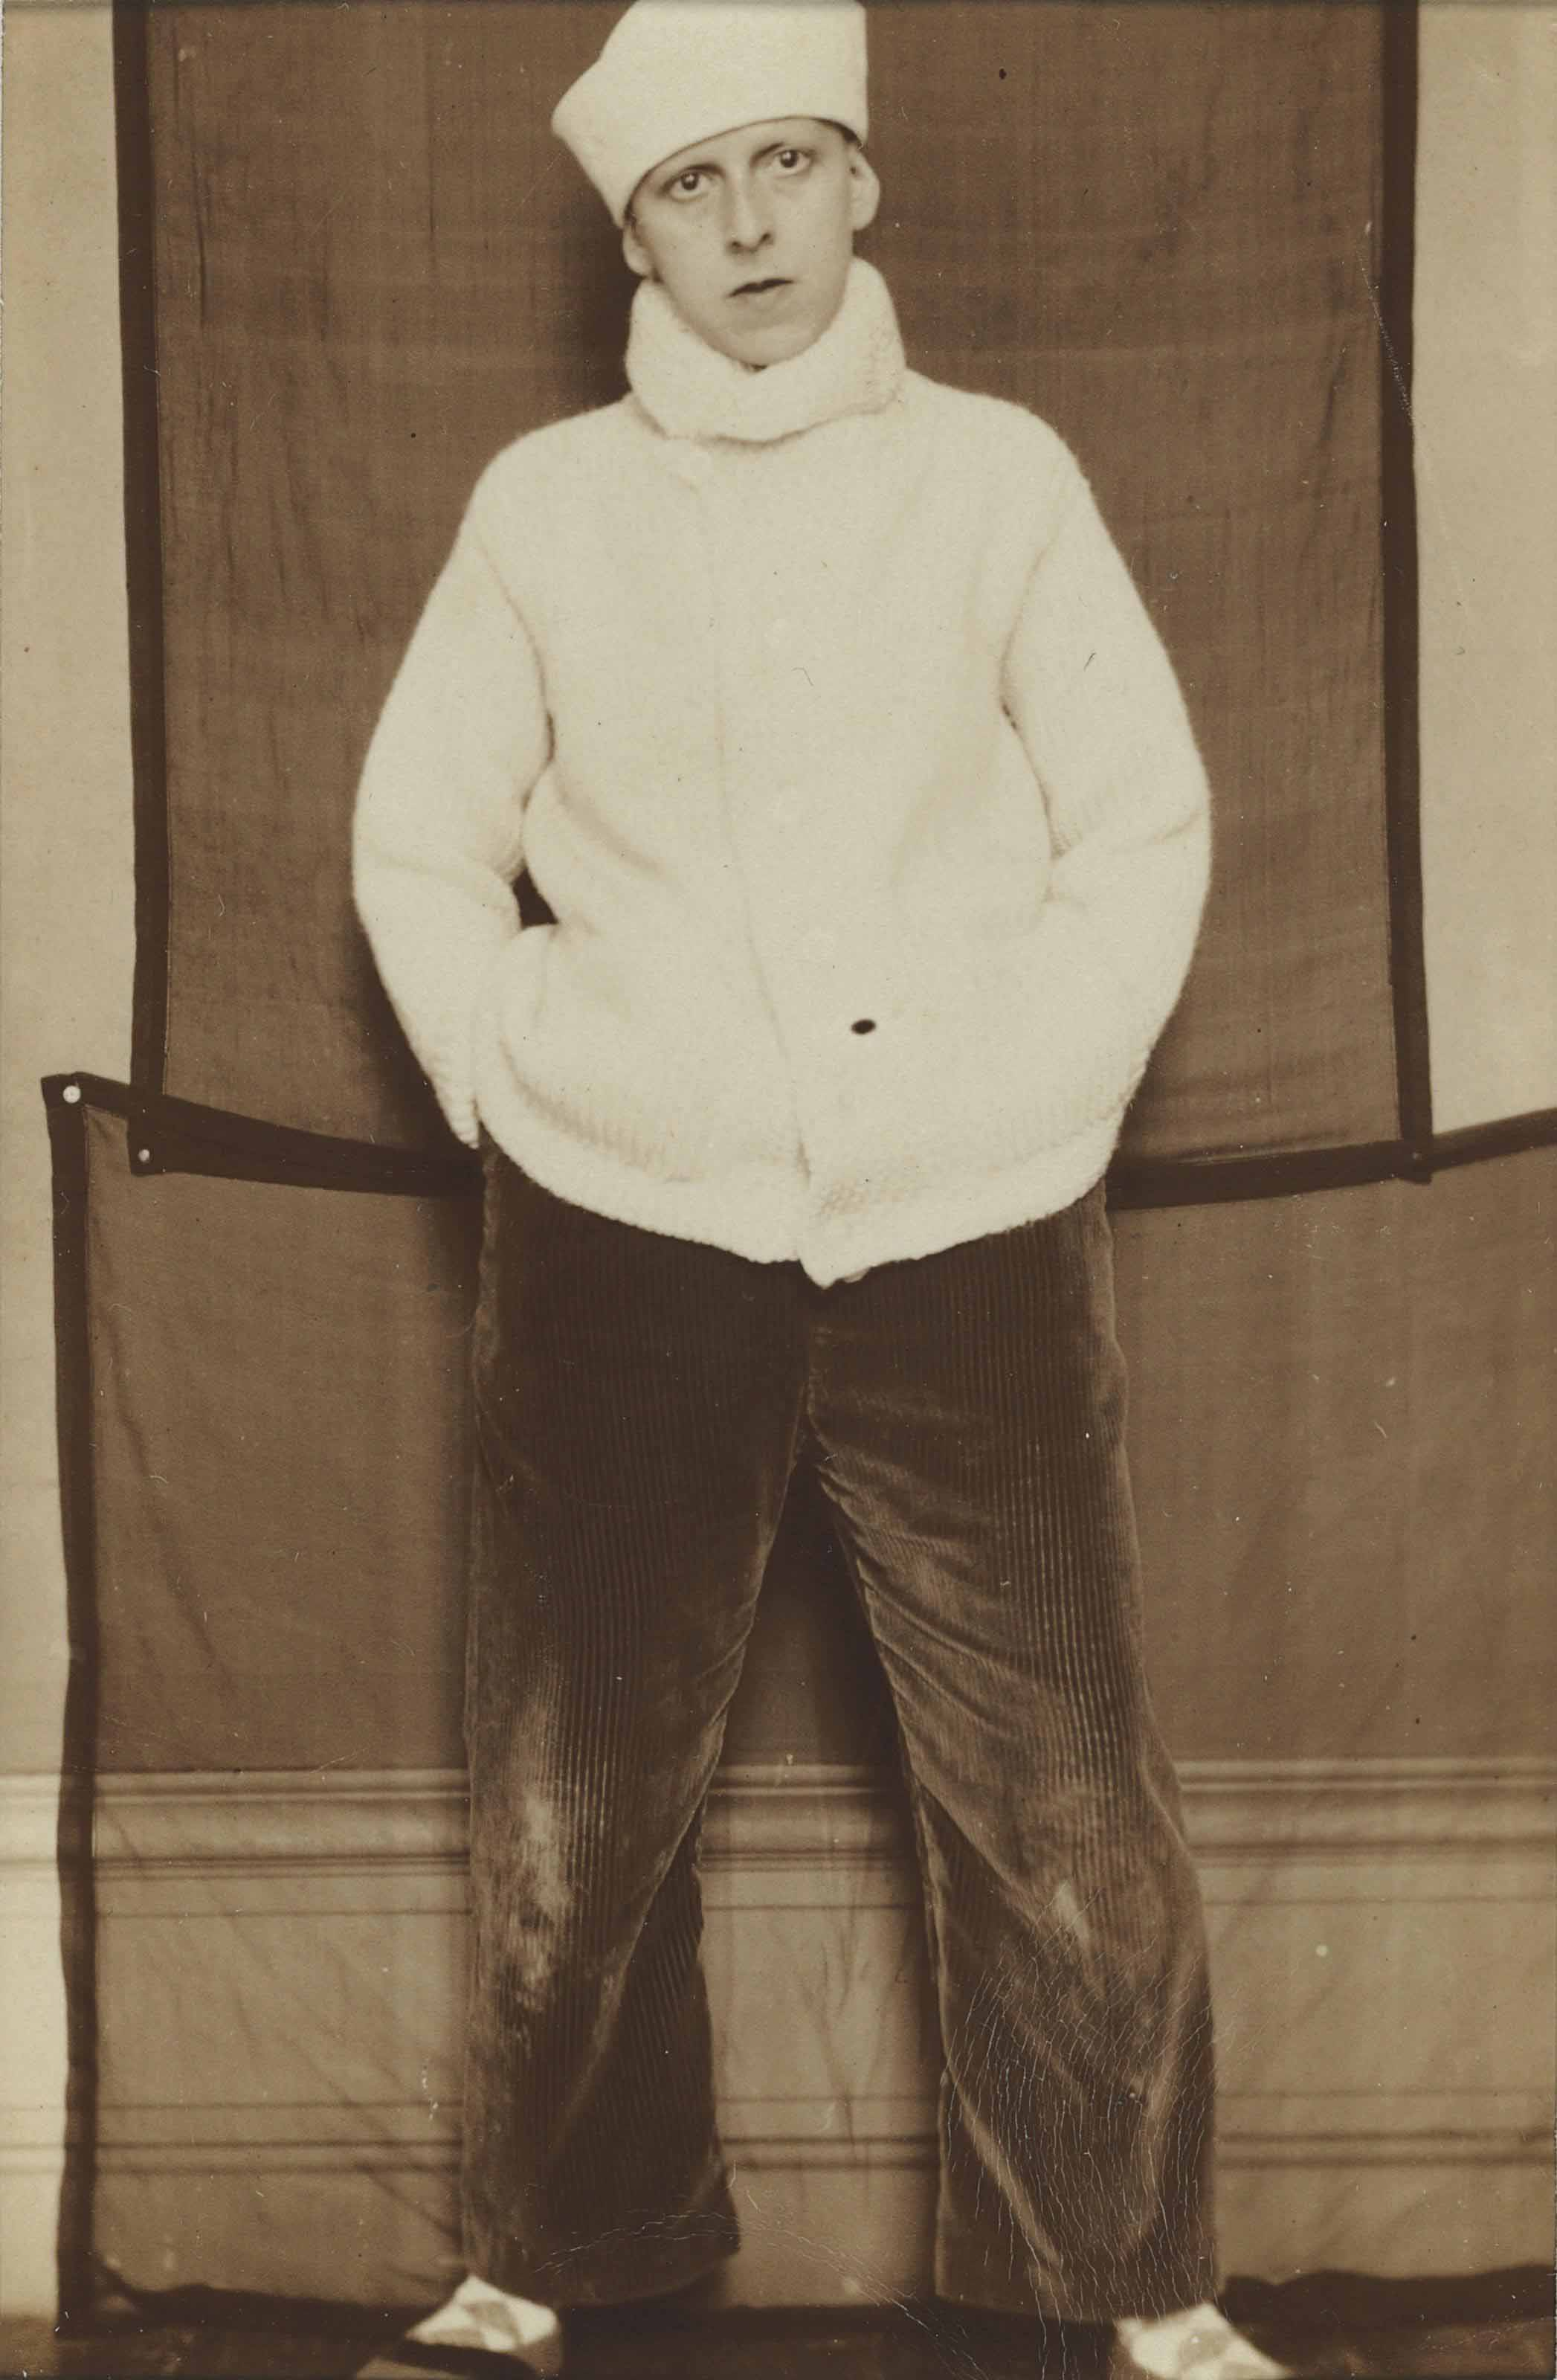 Self Portrait in Sailor Hat, 1920